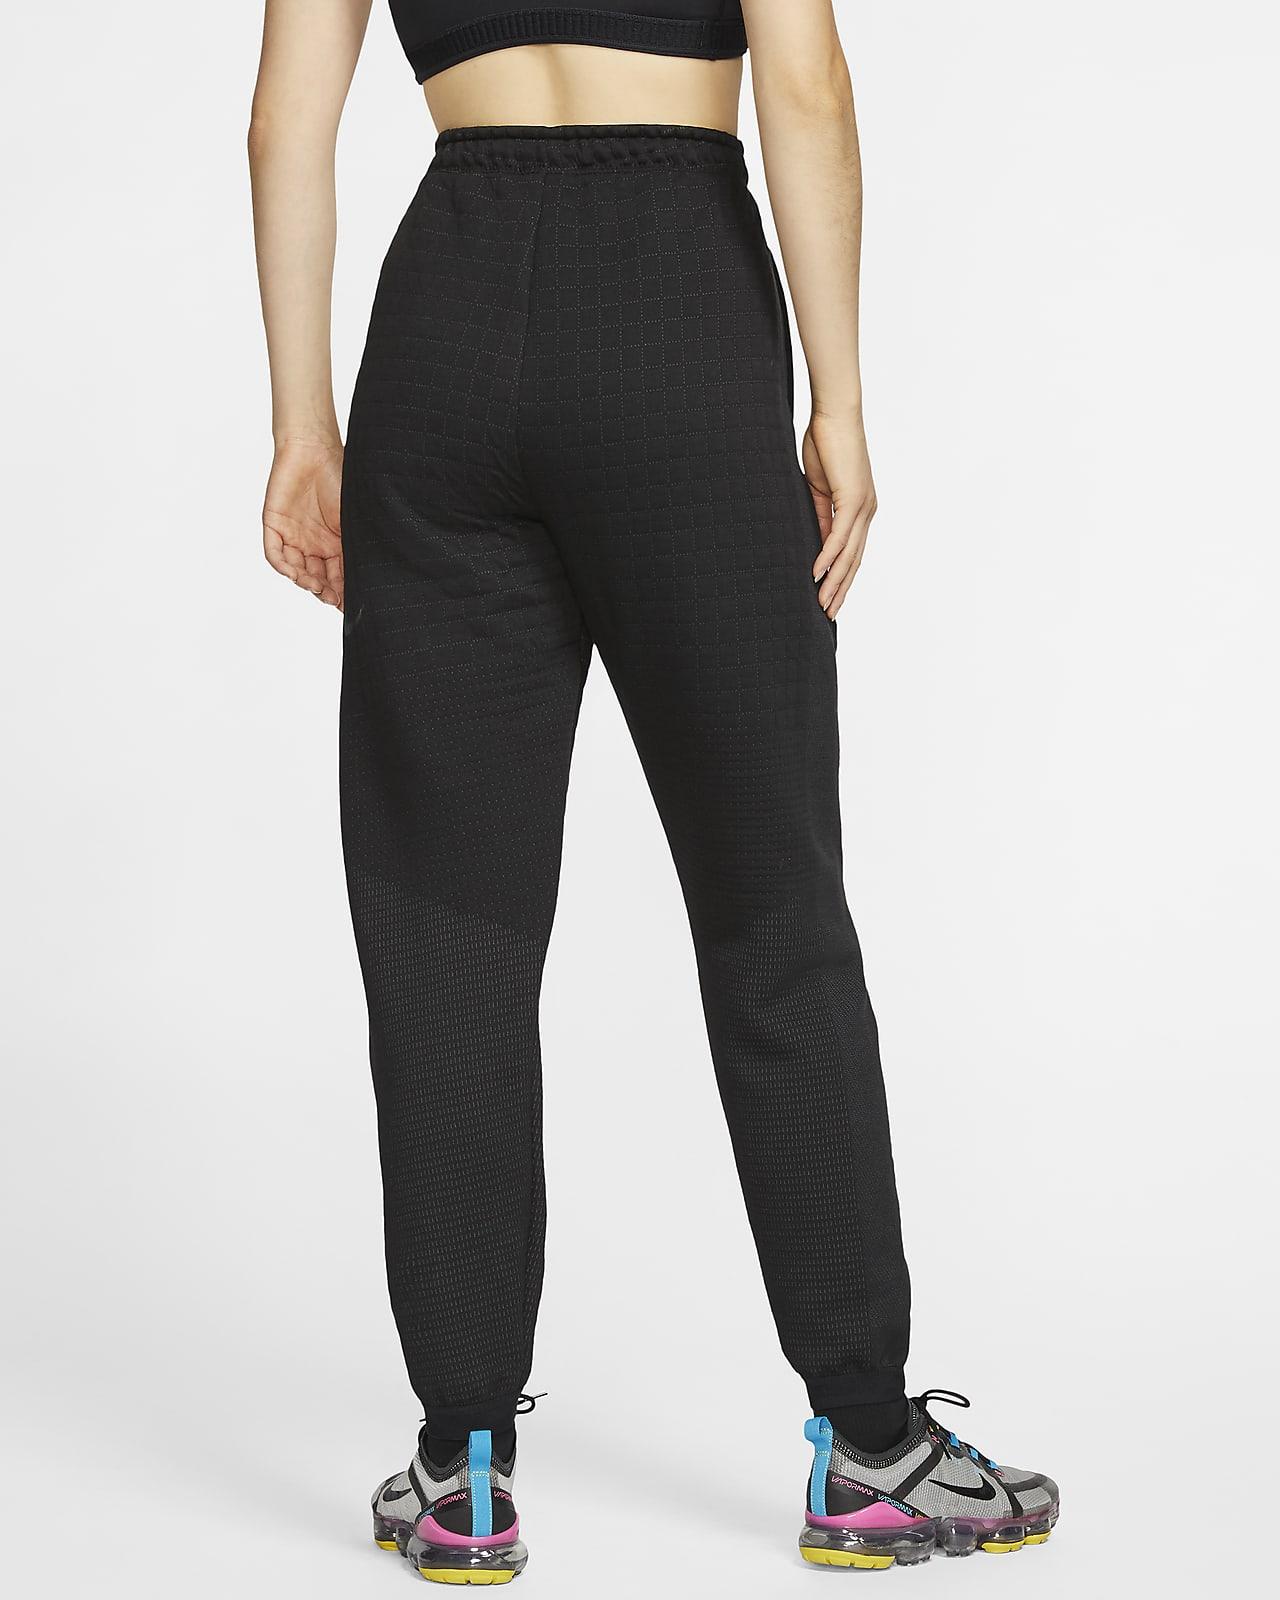 Women's Sale Joggers & Sweatpants. Nike AT